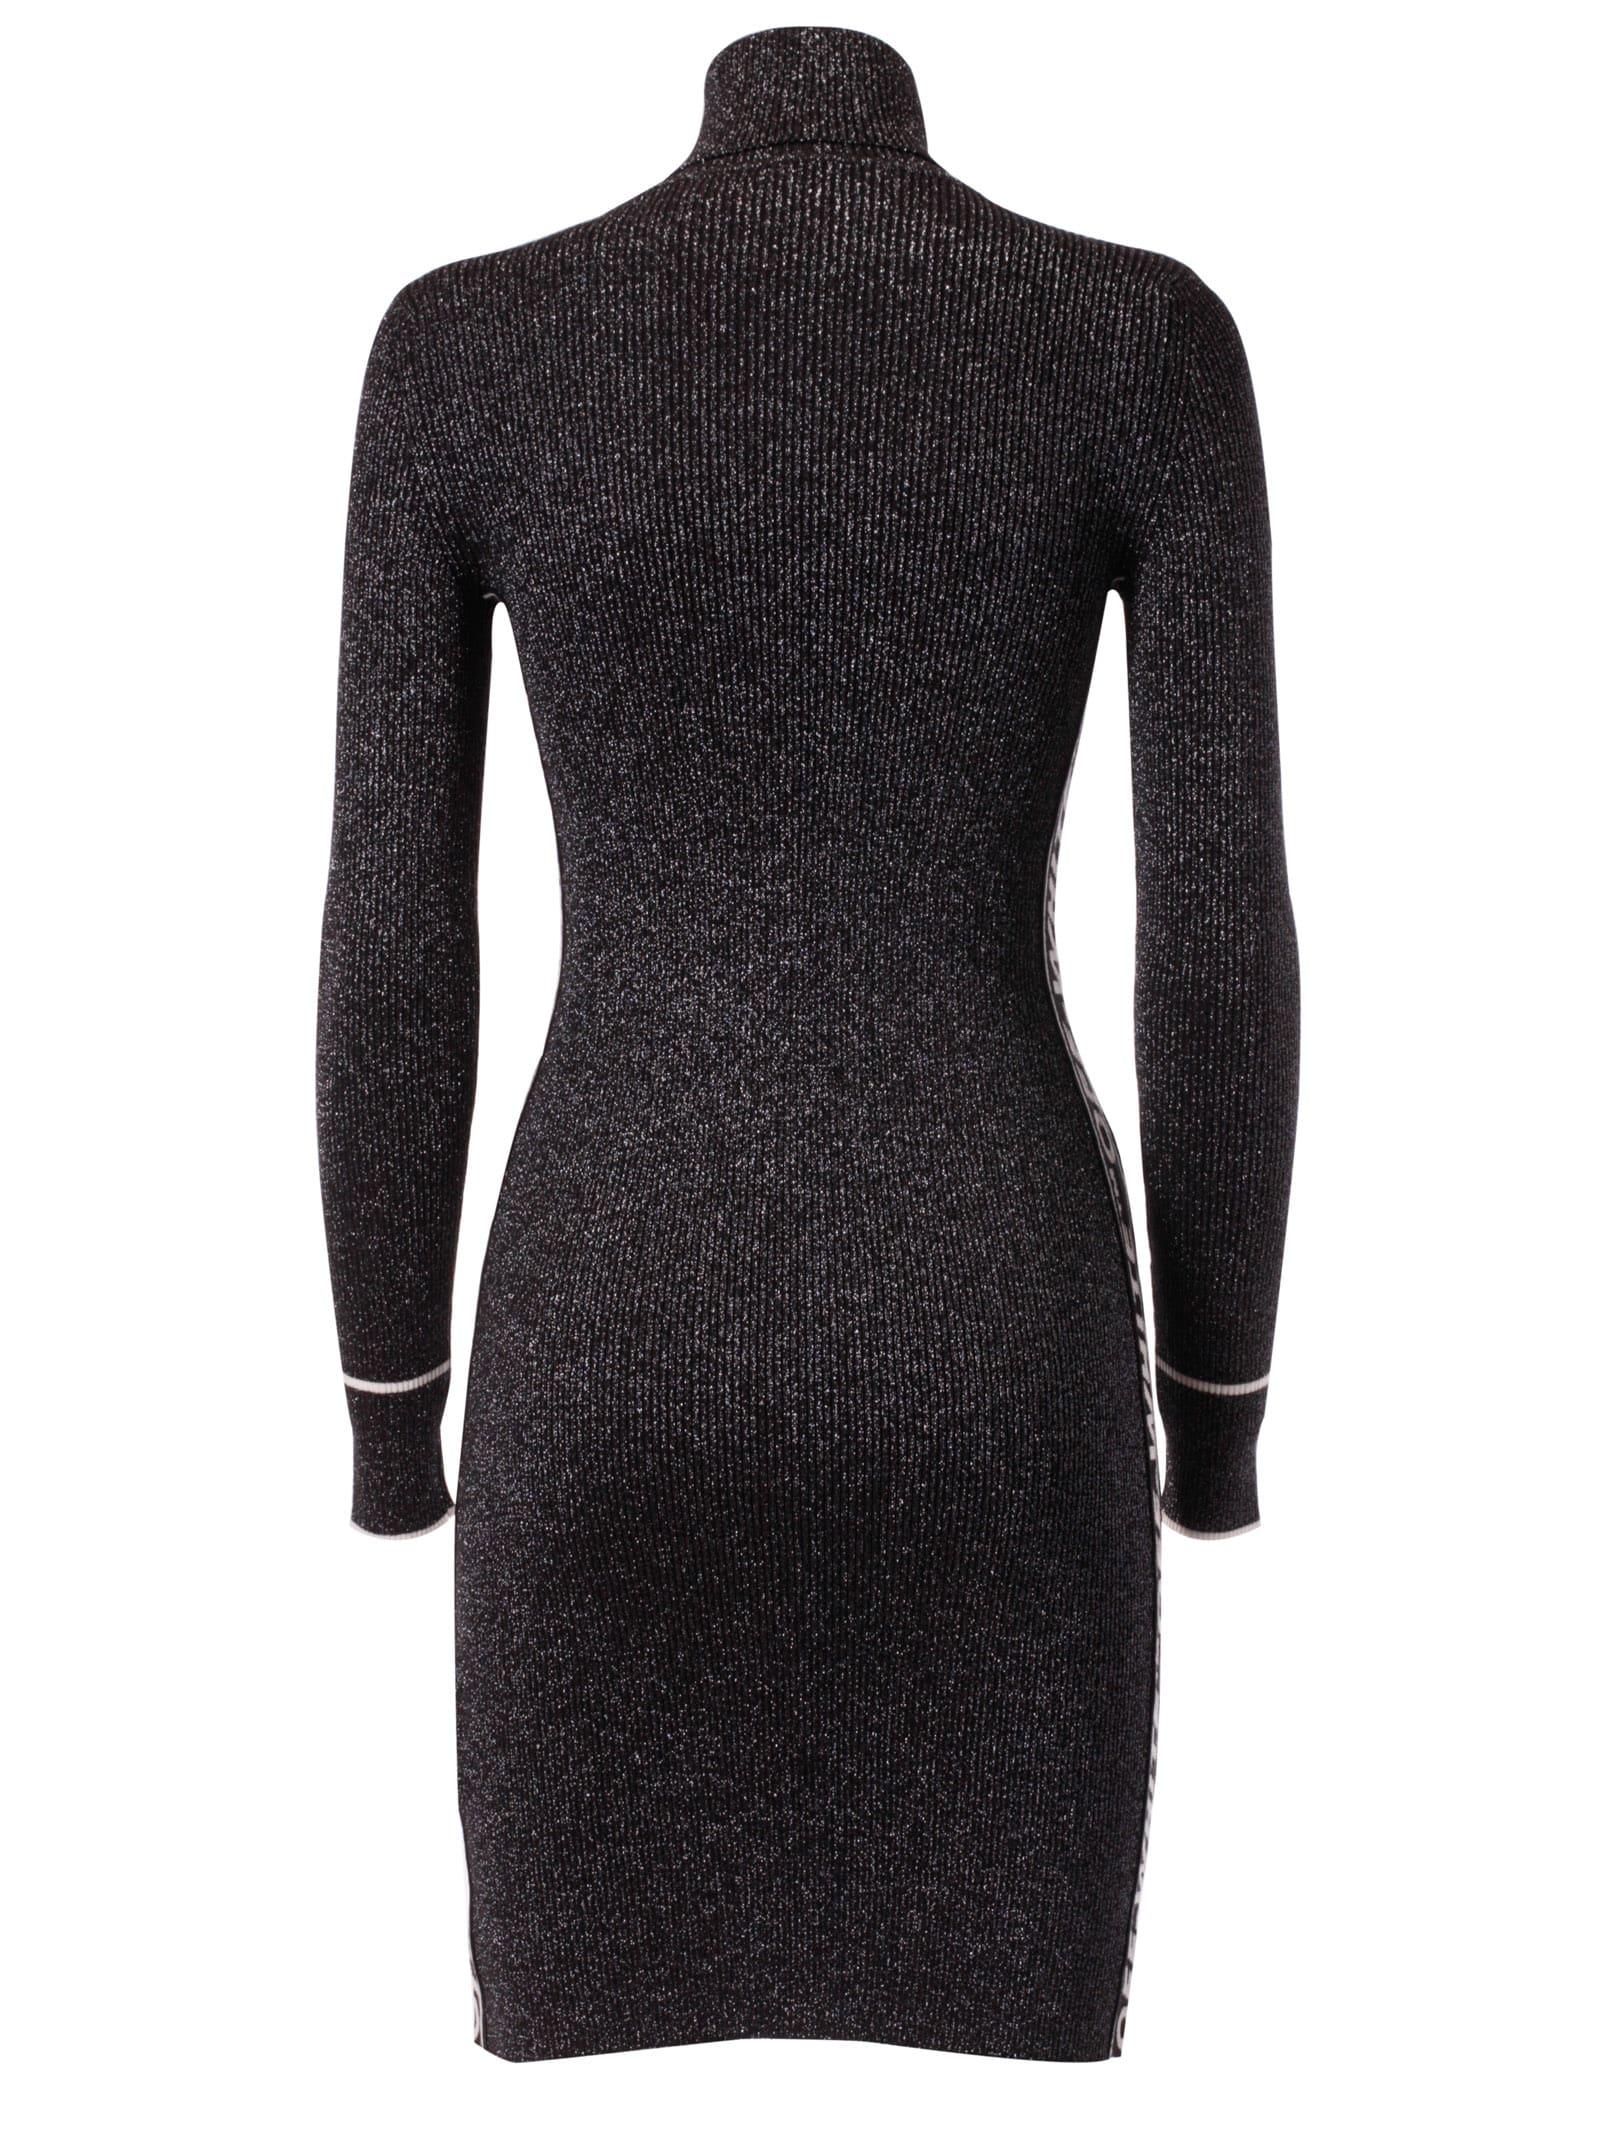 New look sweater off white dress turtleneck ireland catalogs